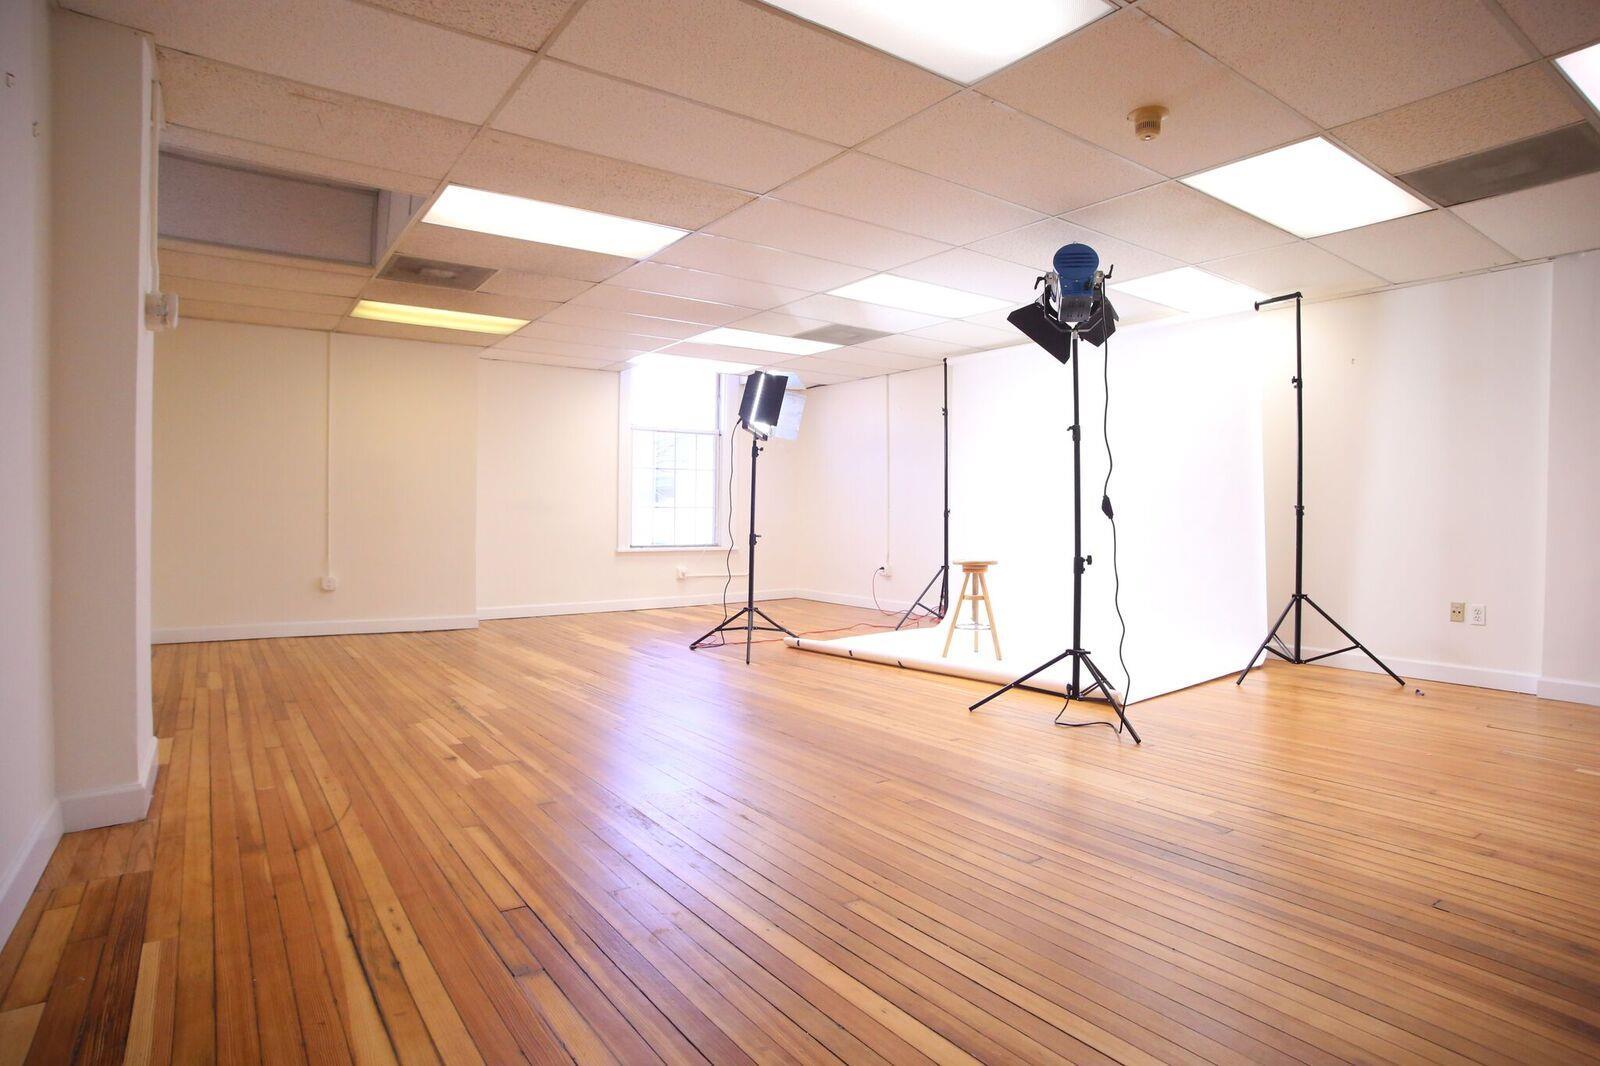 Studio 408 - Studio 408